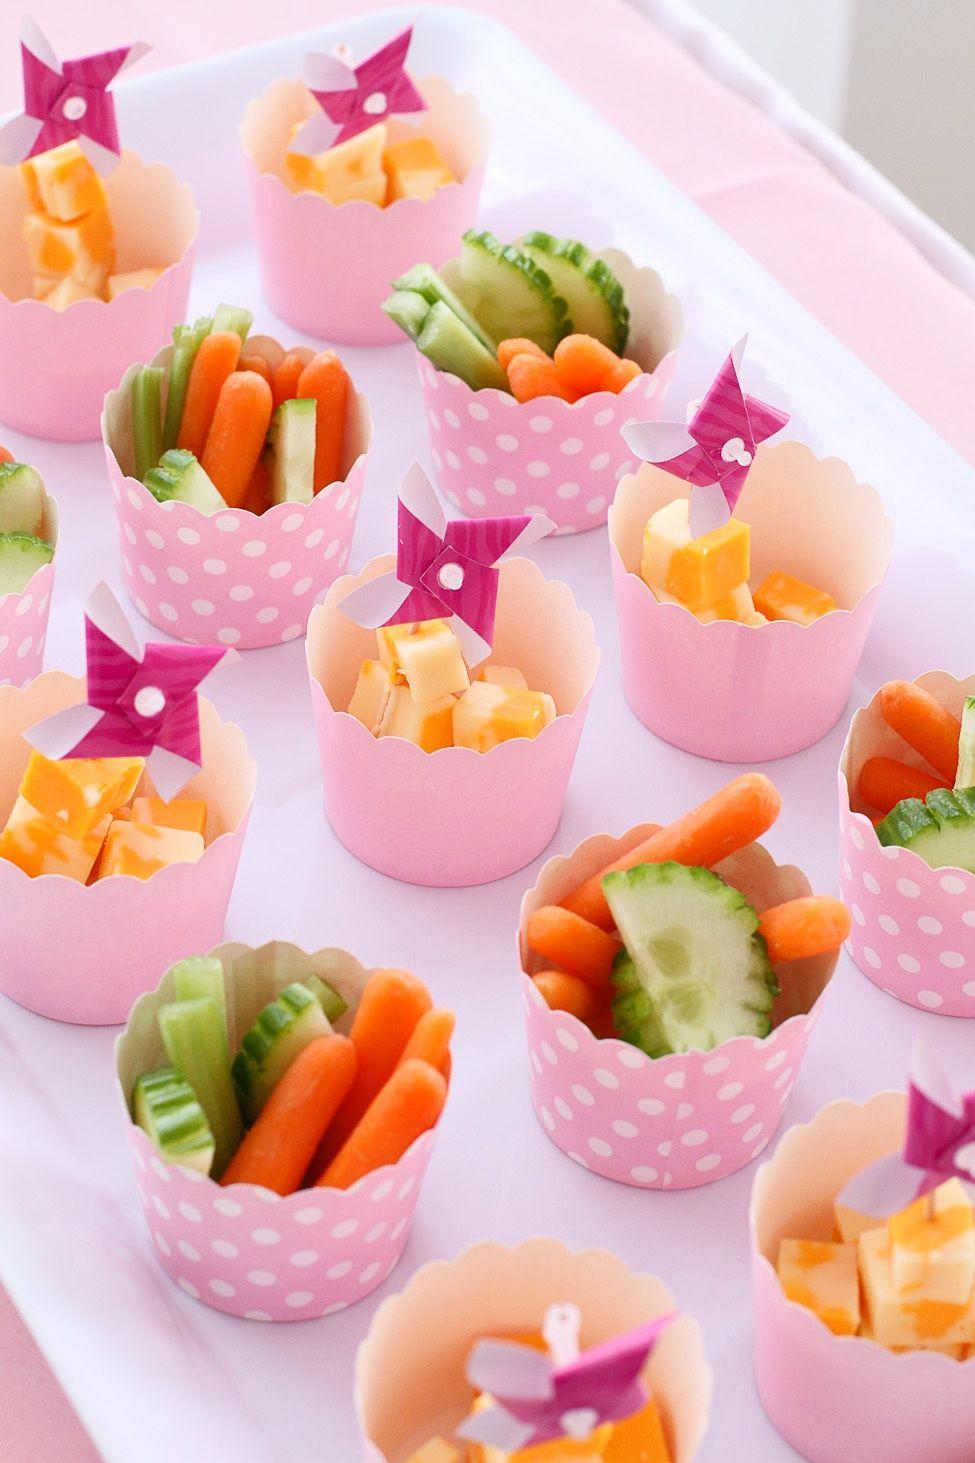 healthy birthday snacks kids birthday snacks birthday party appetizers healthy treats for kids